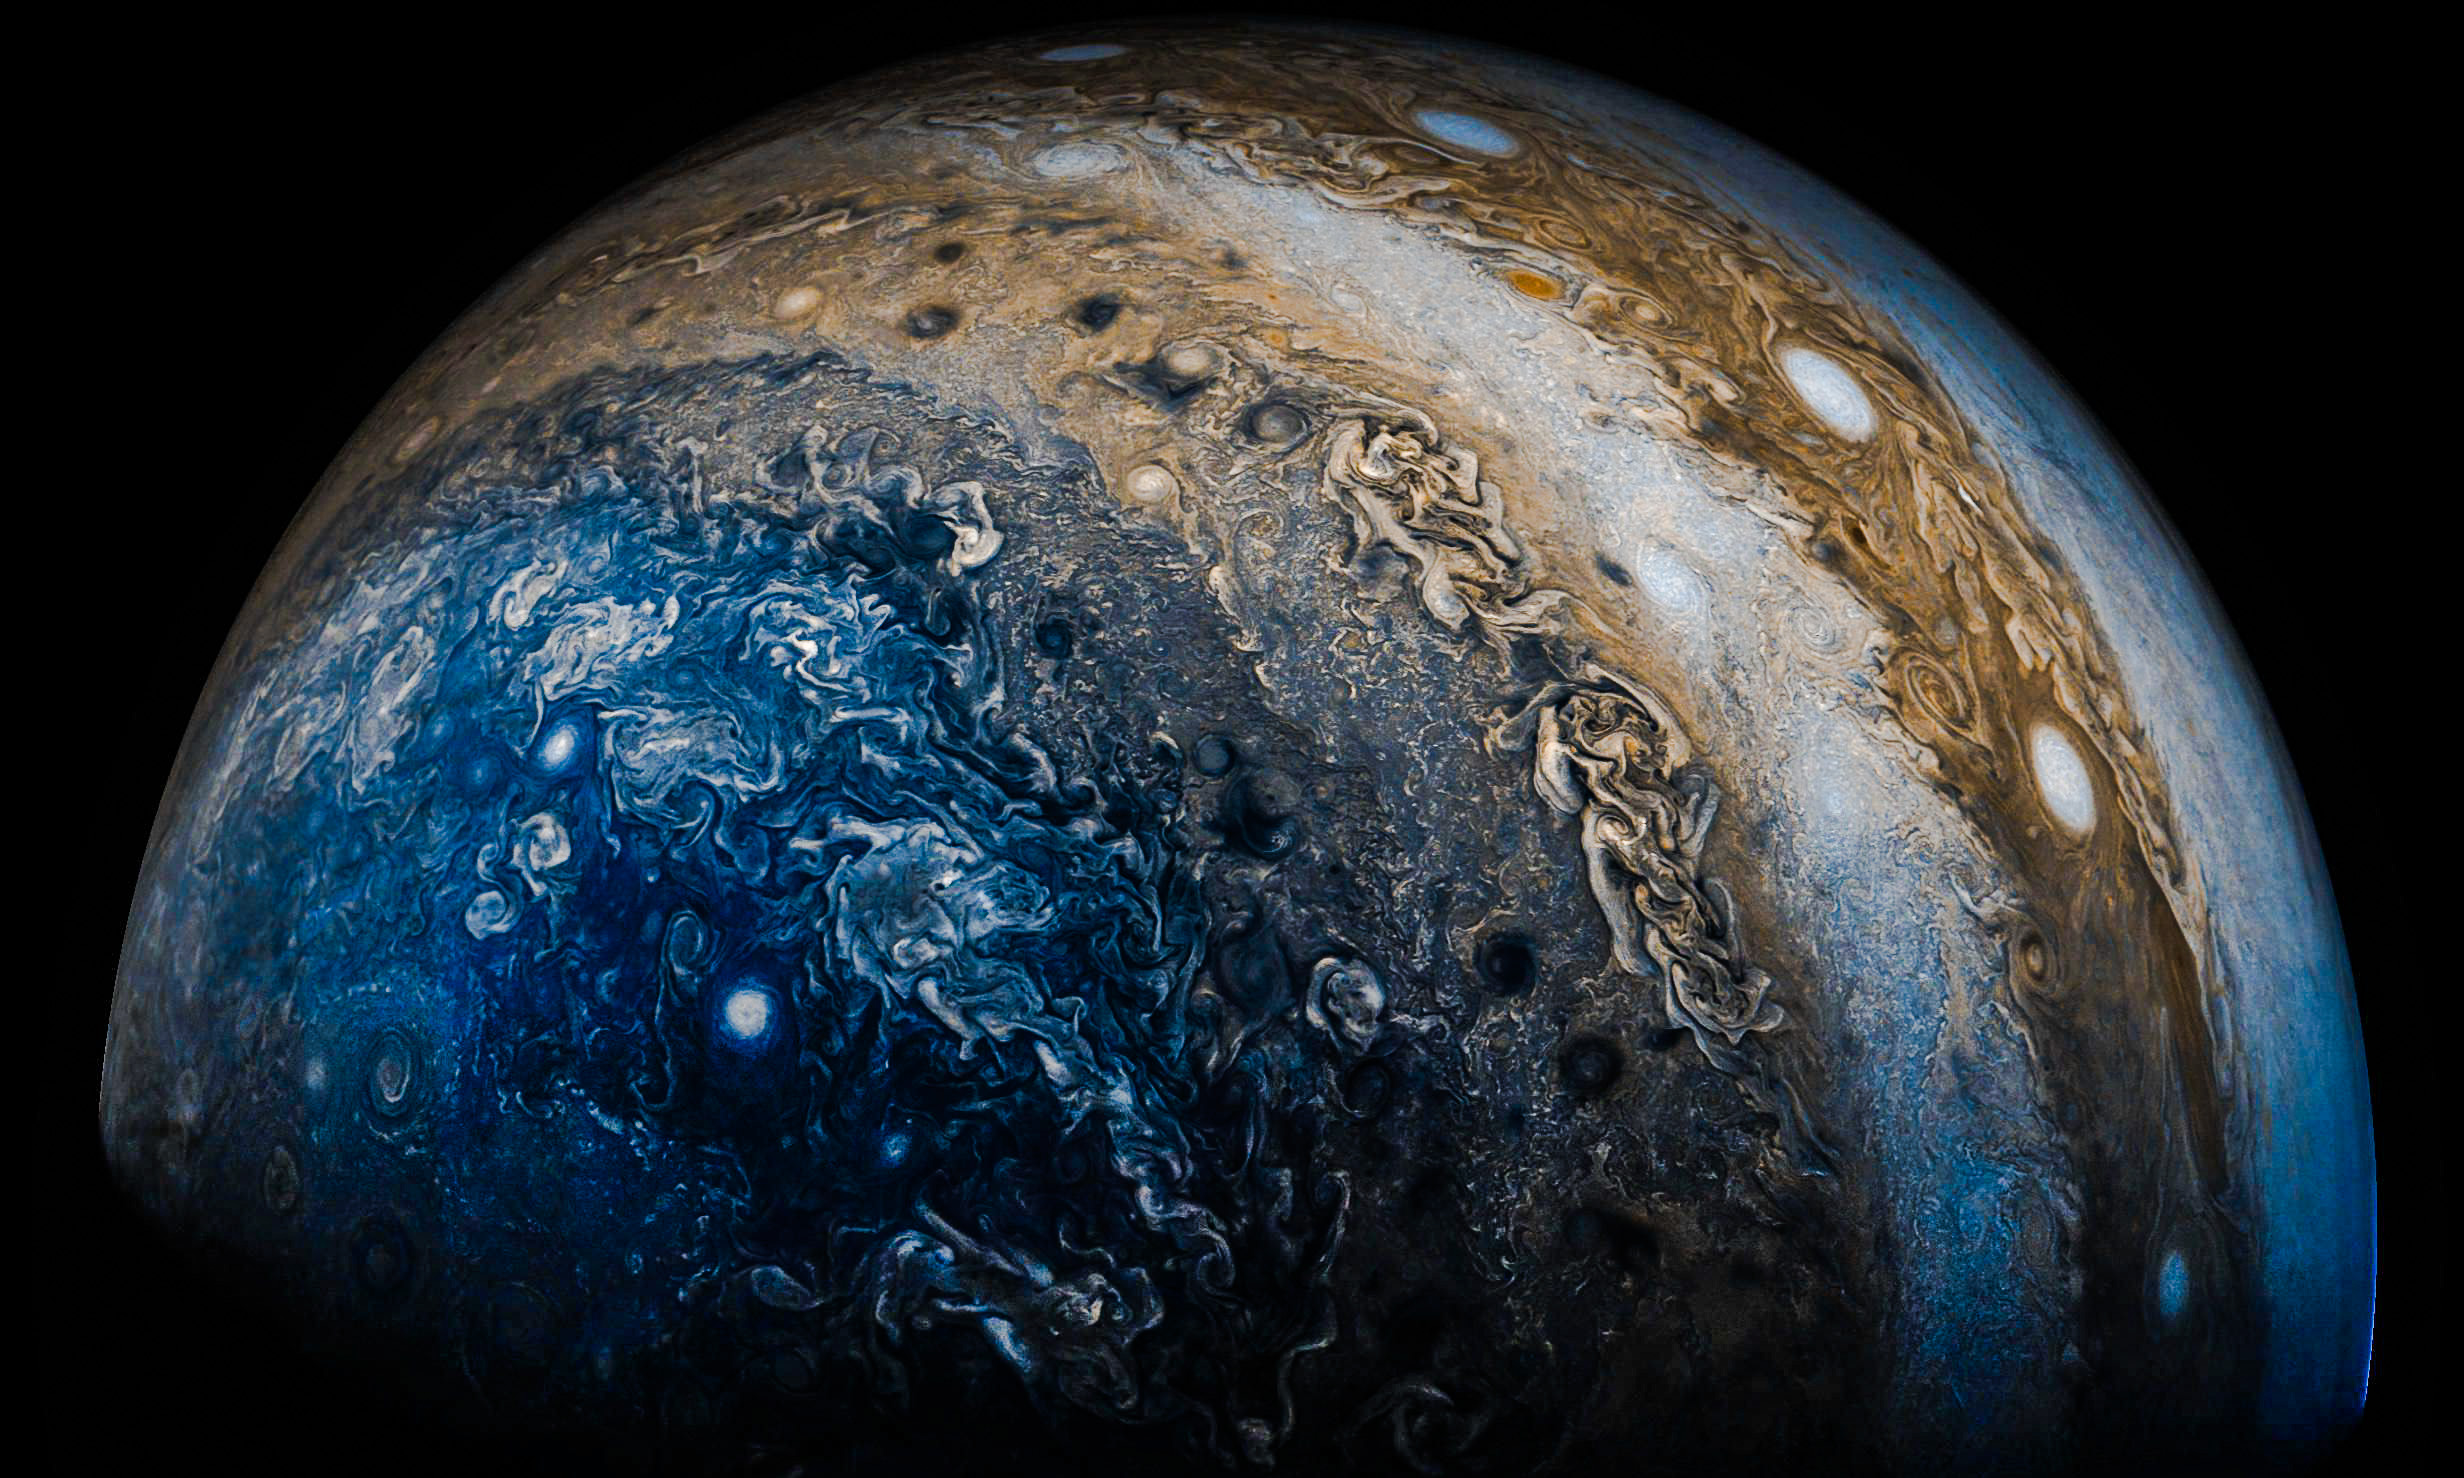 Jupiter Wallpaper   Imgur 2464x1478